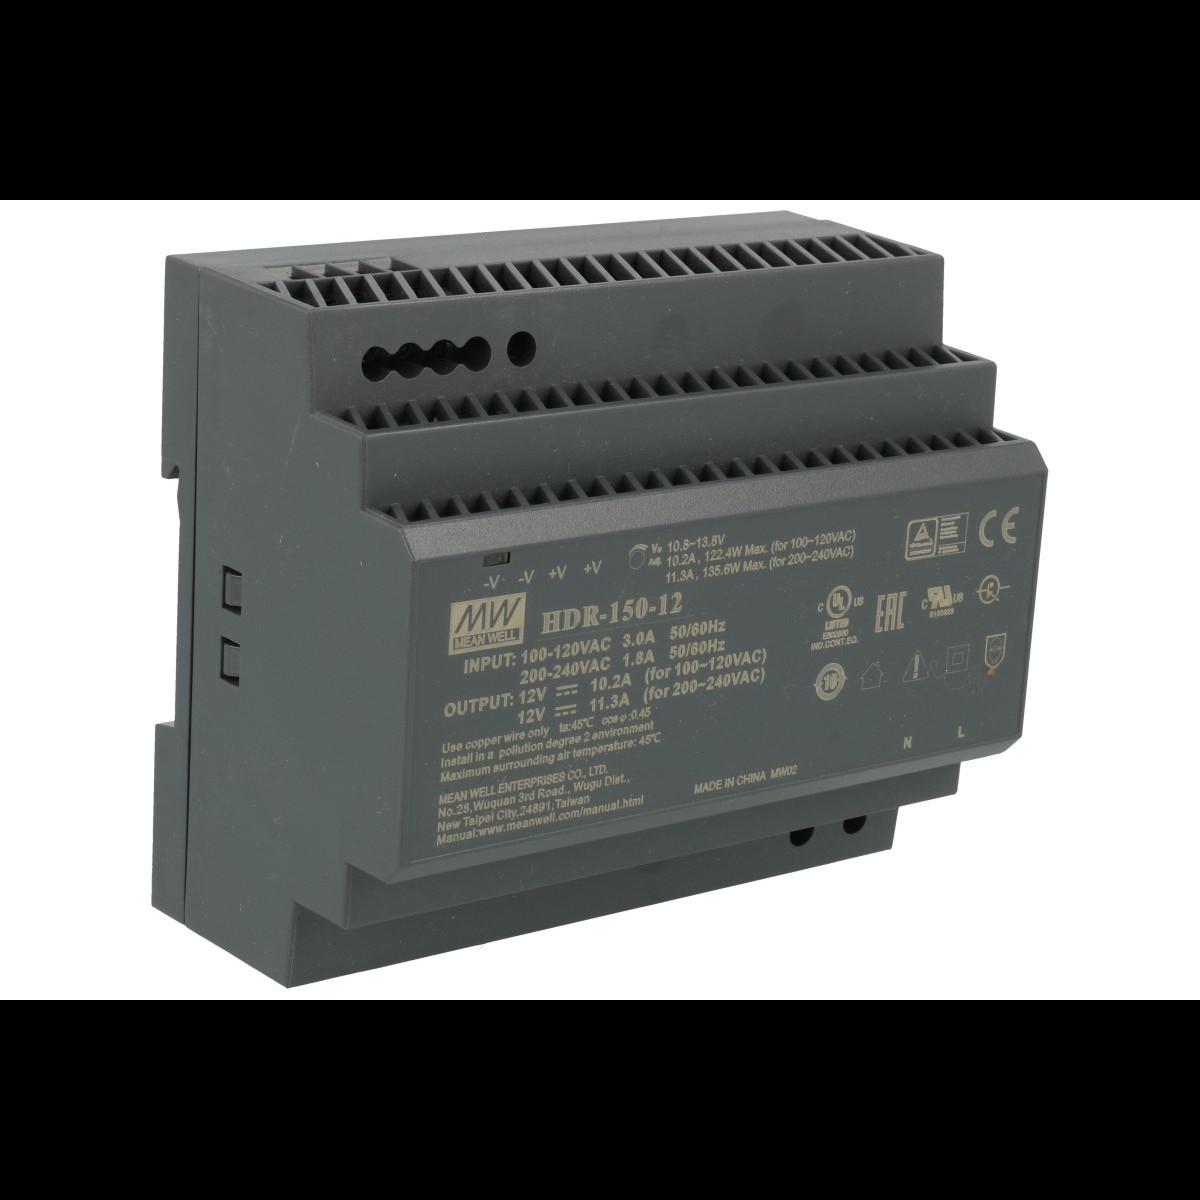 HDR-150-12 Блок питания на DIN-рейку, 12В, 11,3А, 135,6Вт Mean Well